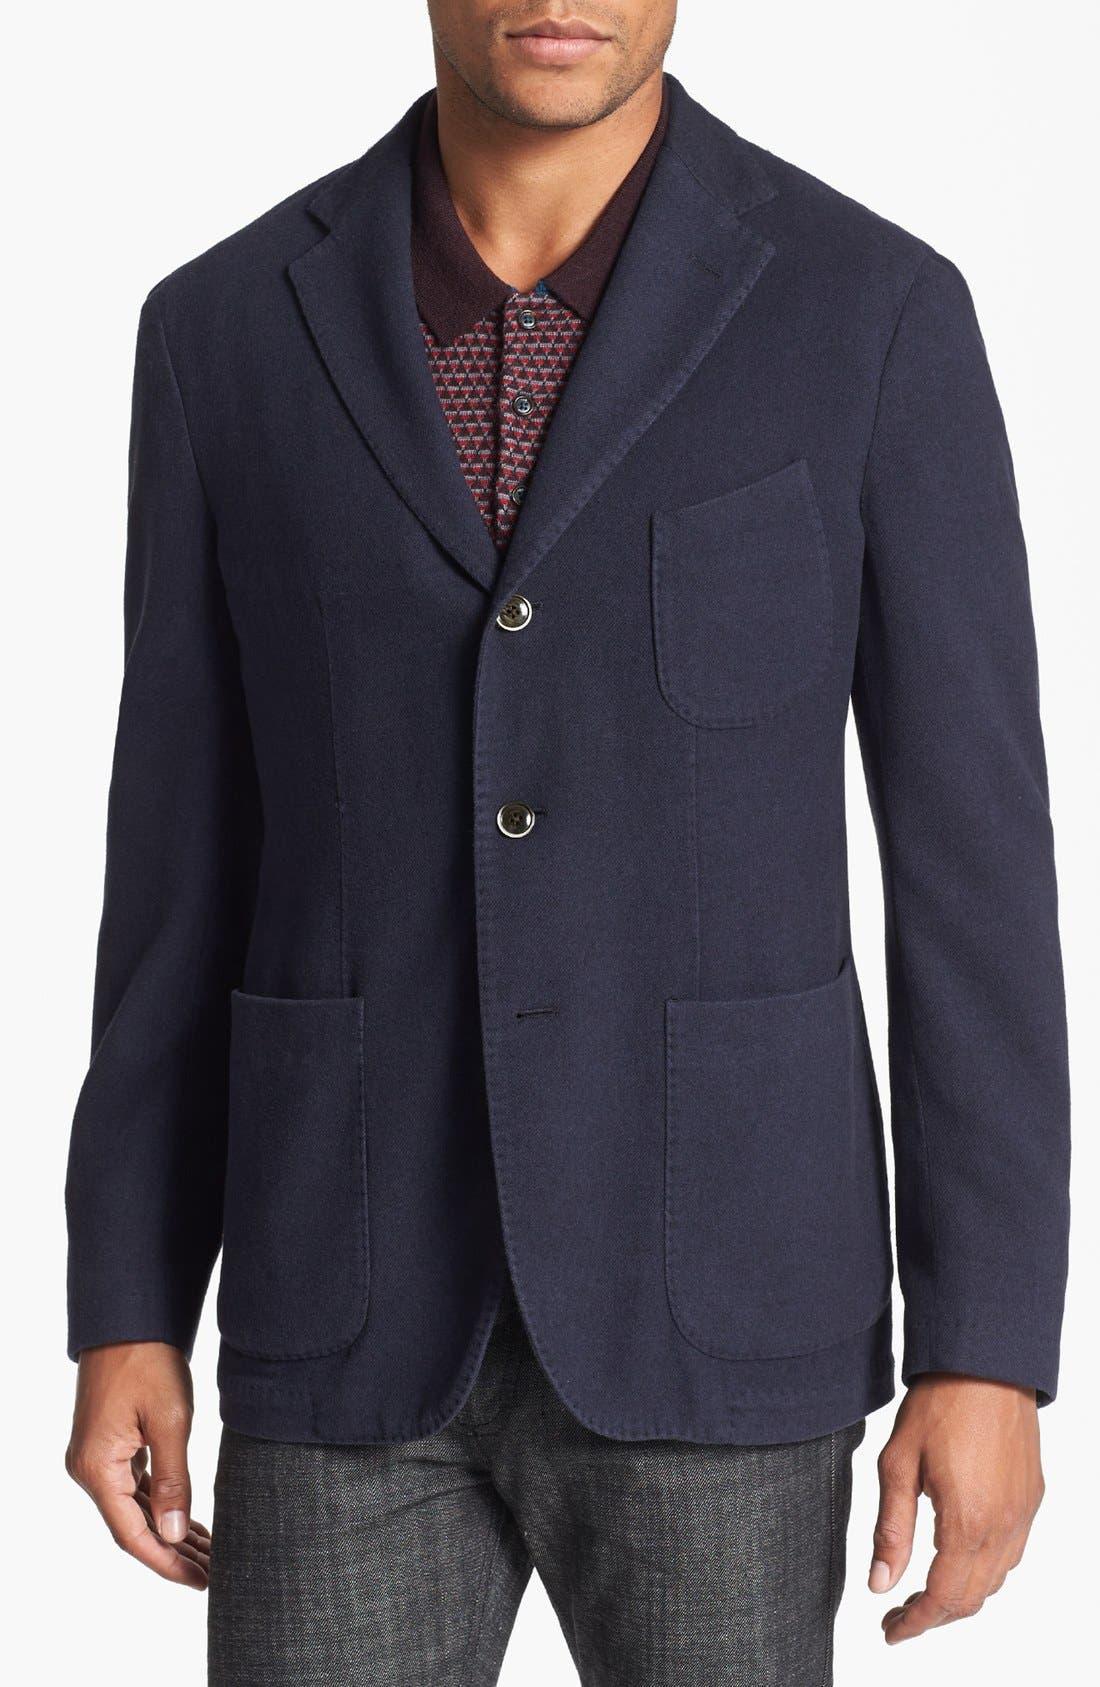 Main Image - Canali Silk & Cashmere Sportcoat